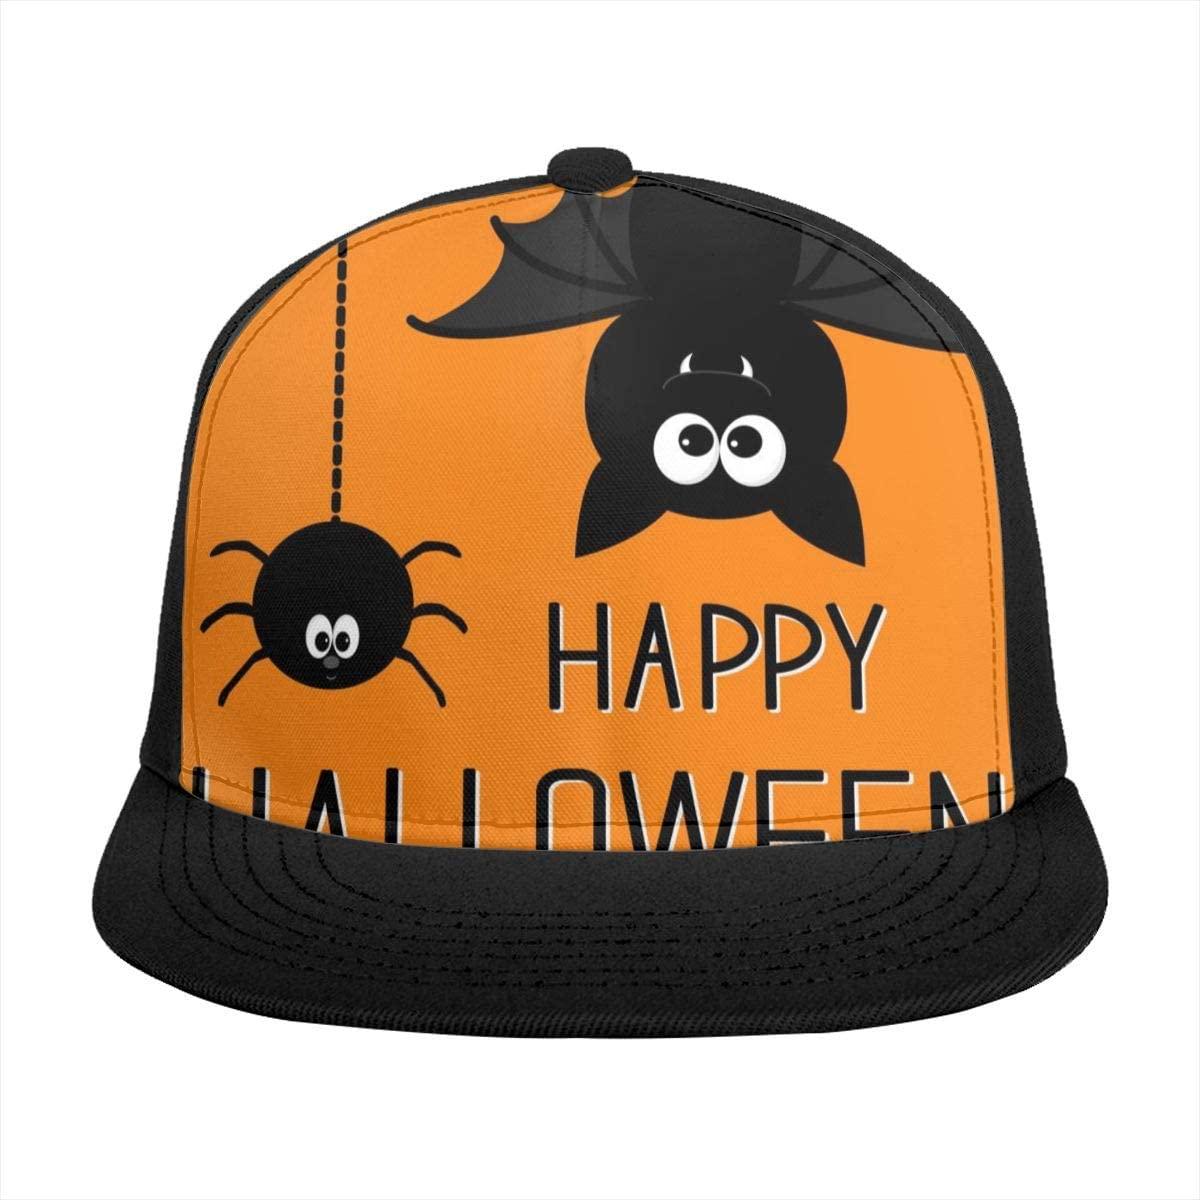 Sun Visor Hat Cute Bat, Hanging Spider, Happy Halloween, Black Orange Baseball Cap Flat Brim Hat for Women Men Summer